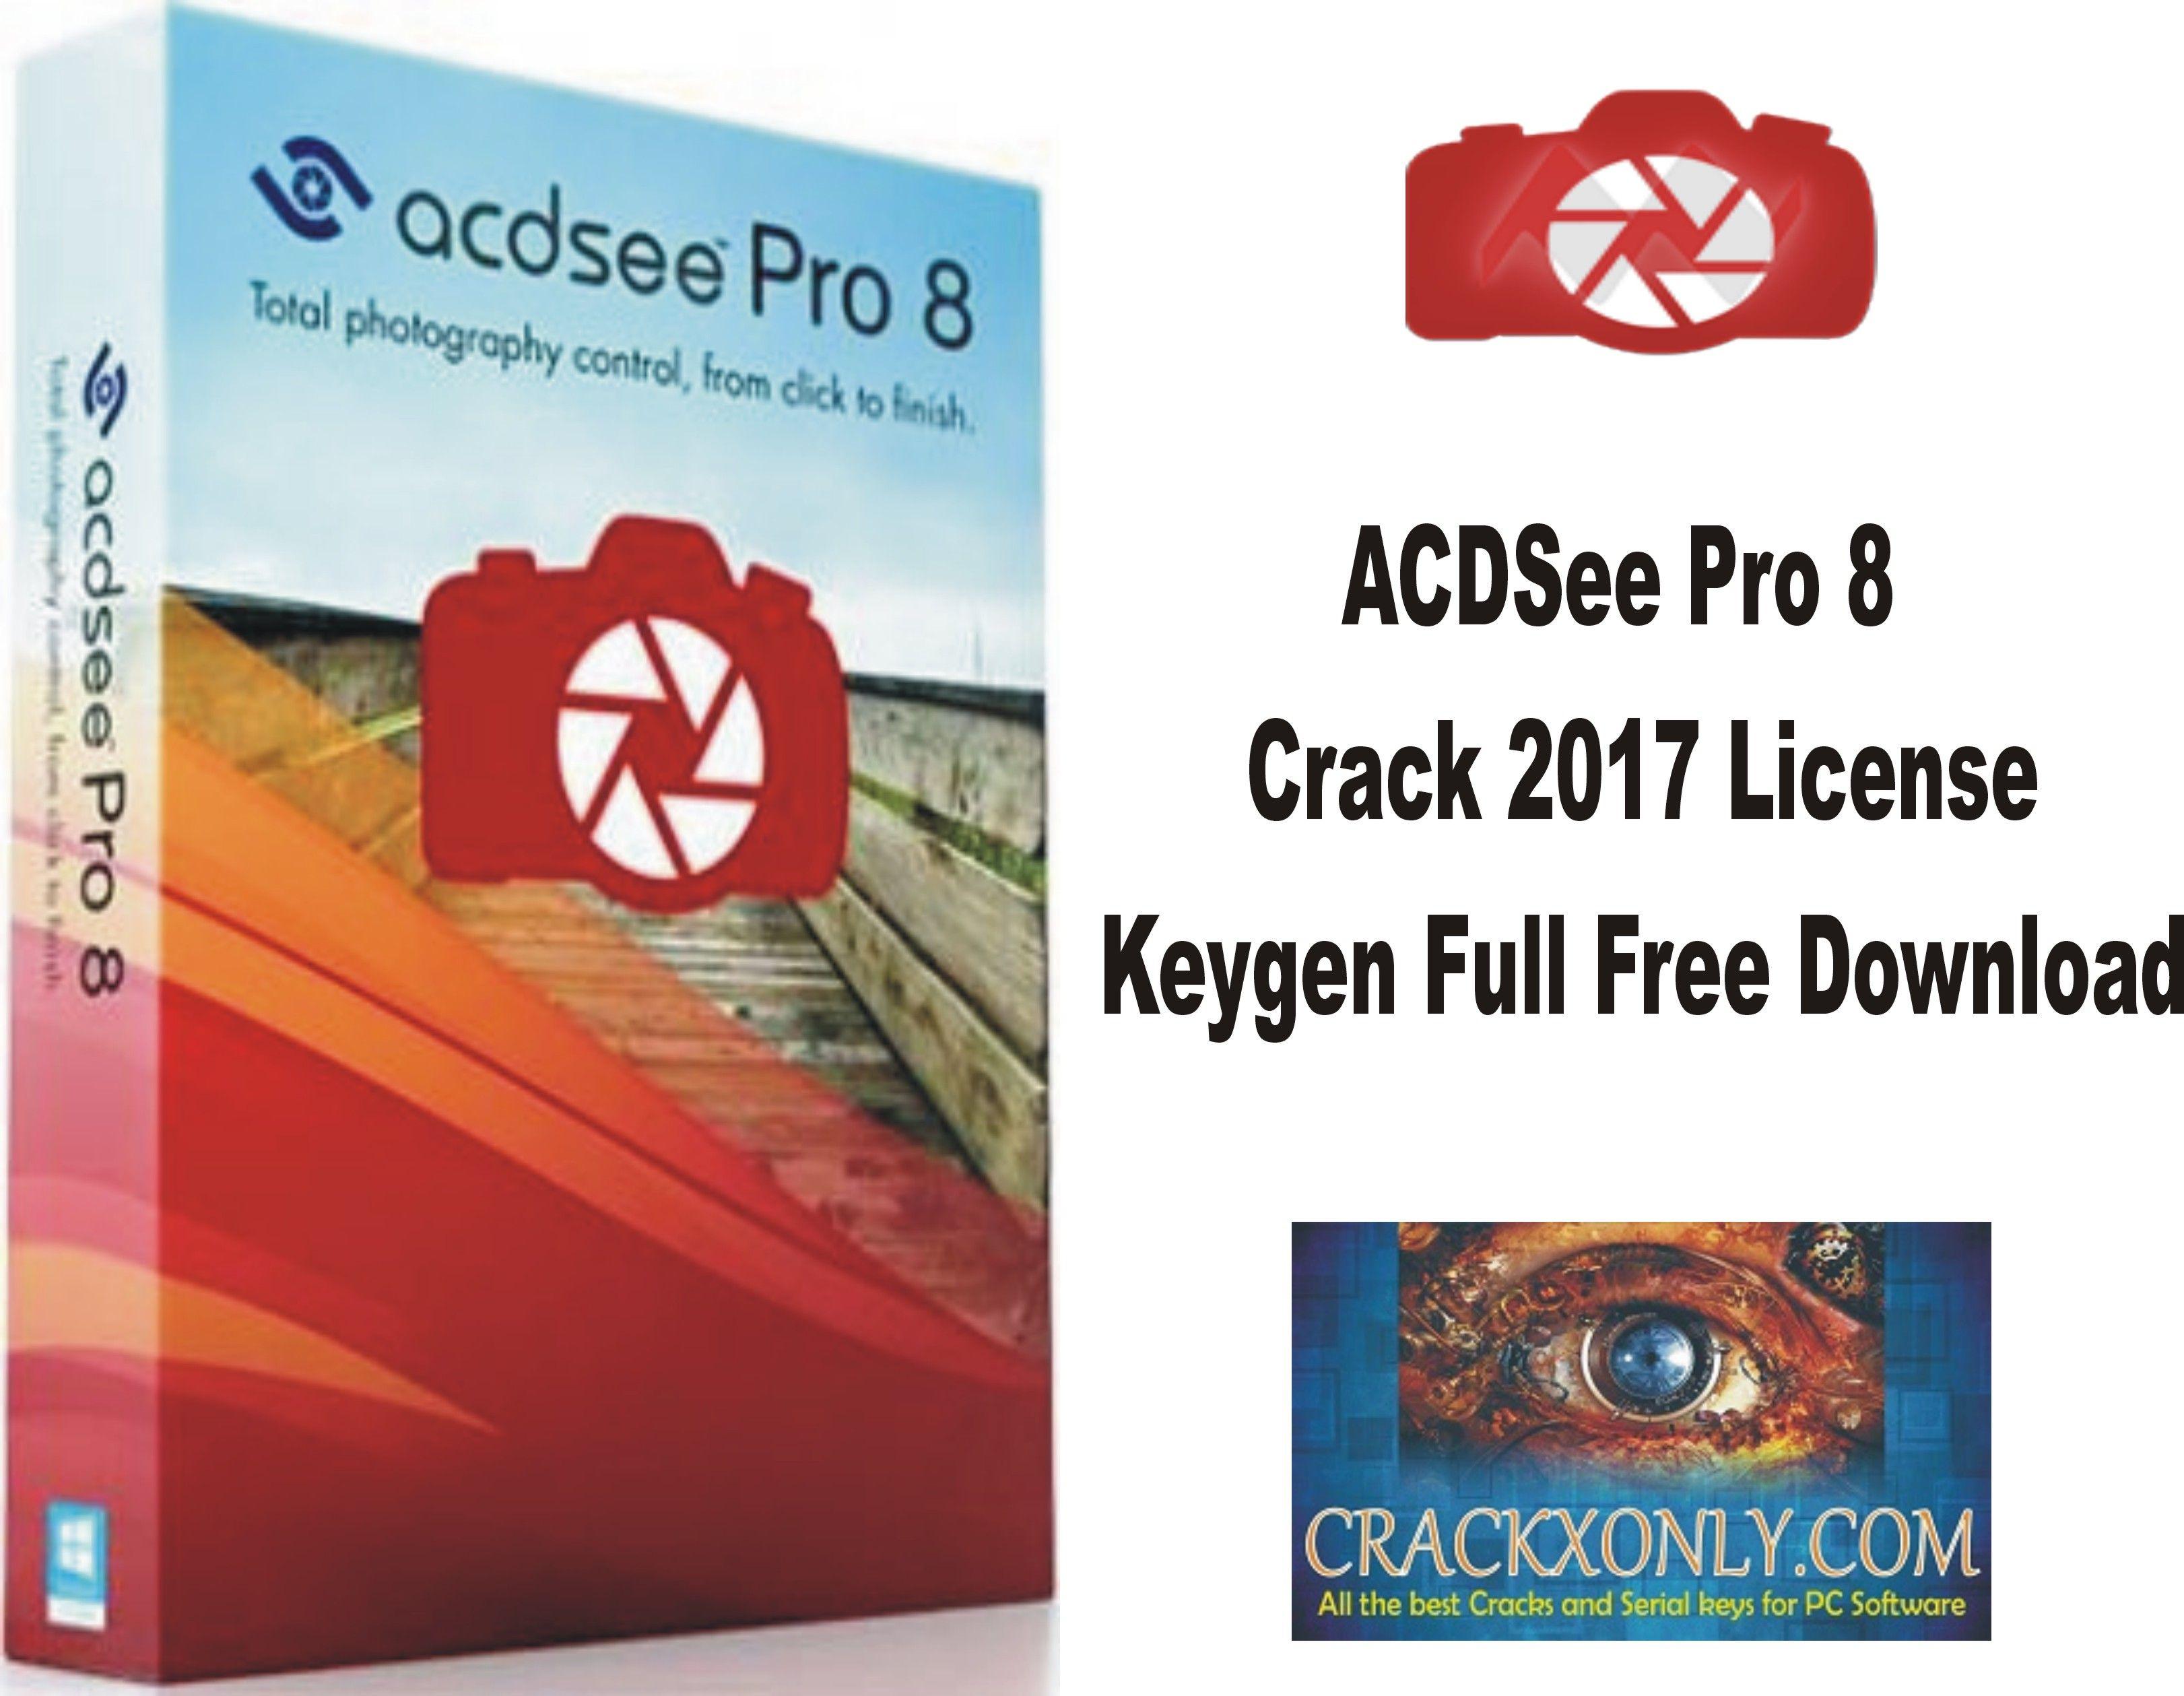 Acdsee pro 8 license key 2017